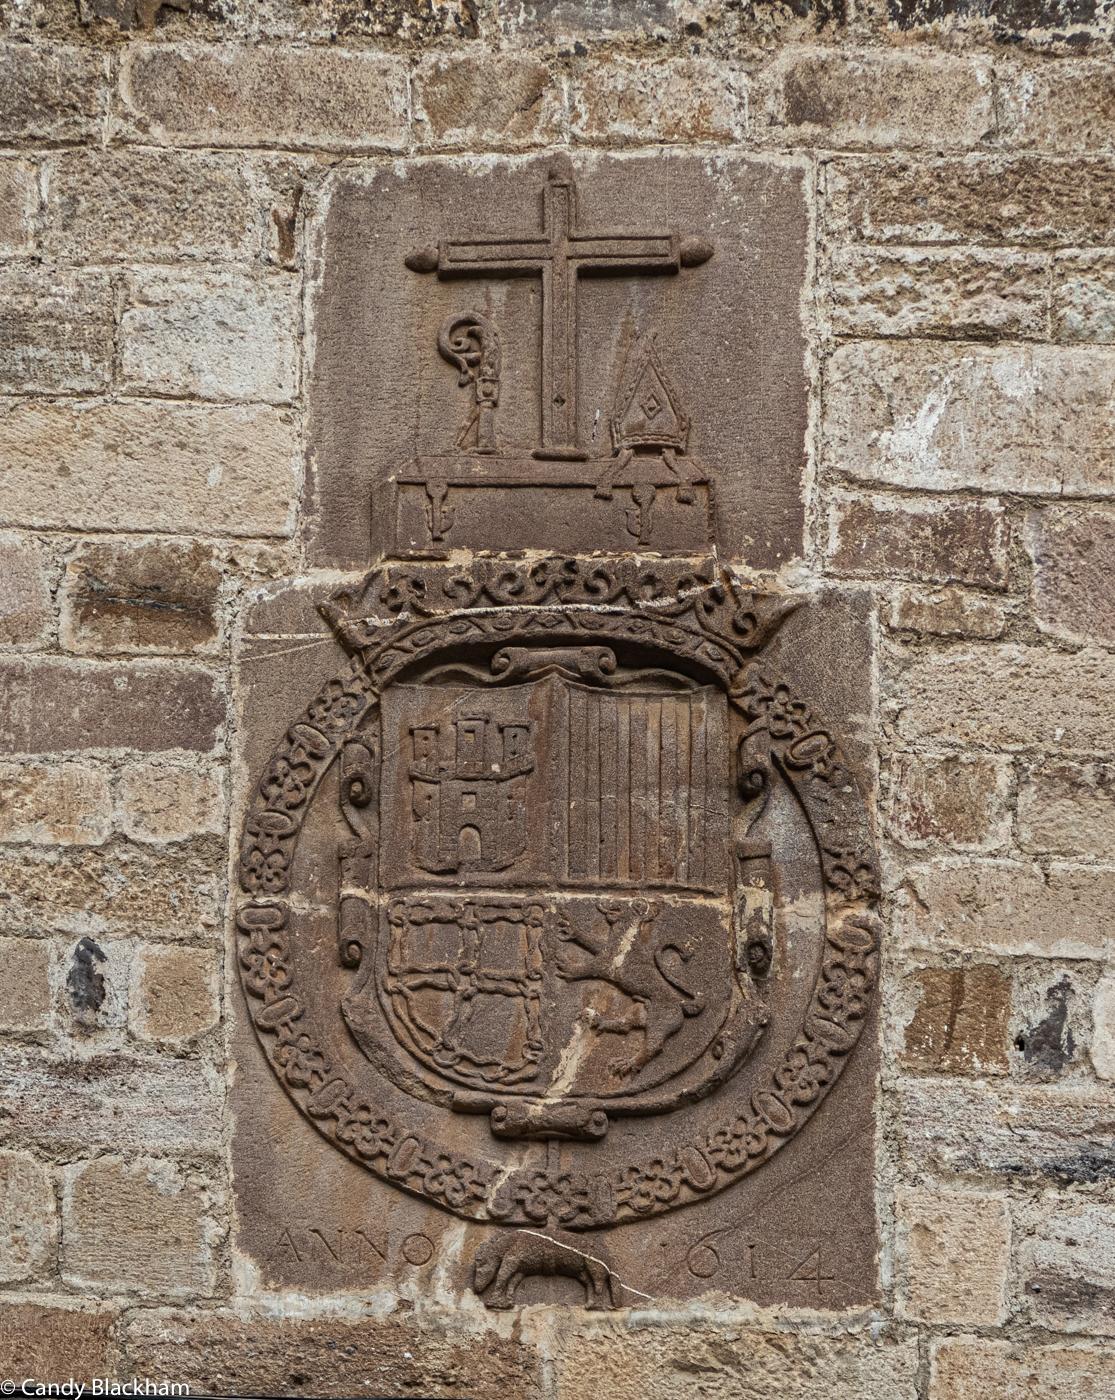 The Coat of Arms above the monastery door